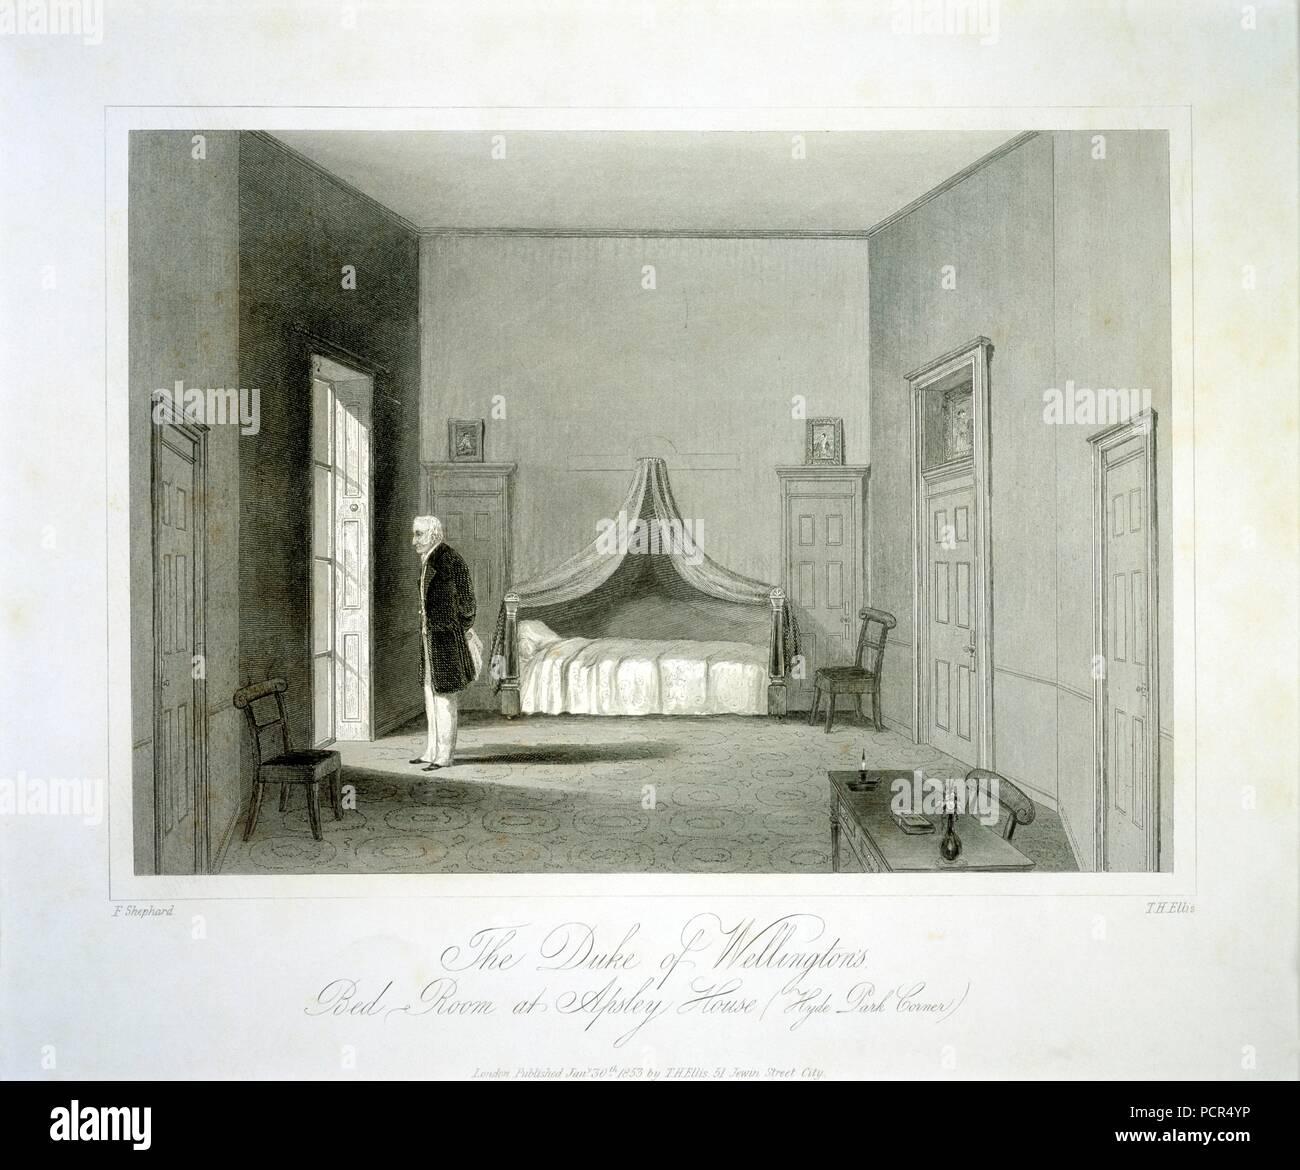 The Duke of Wellington's bedroom, Apsley House, London, 19th century. - Stock Image